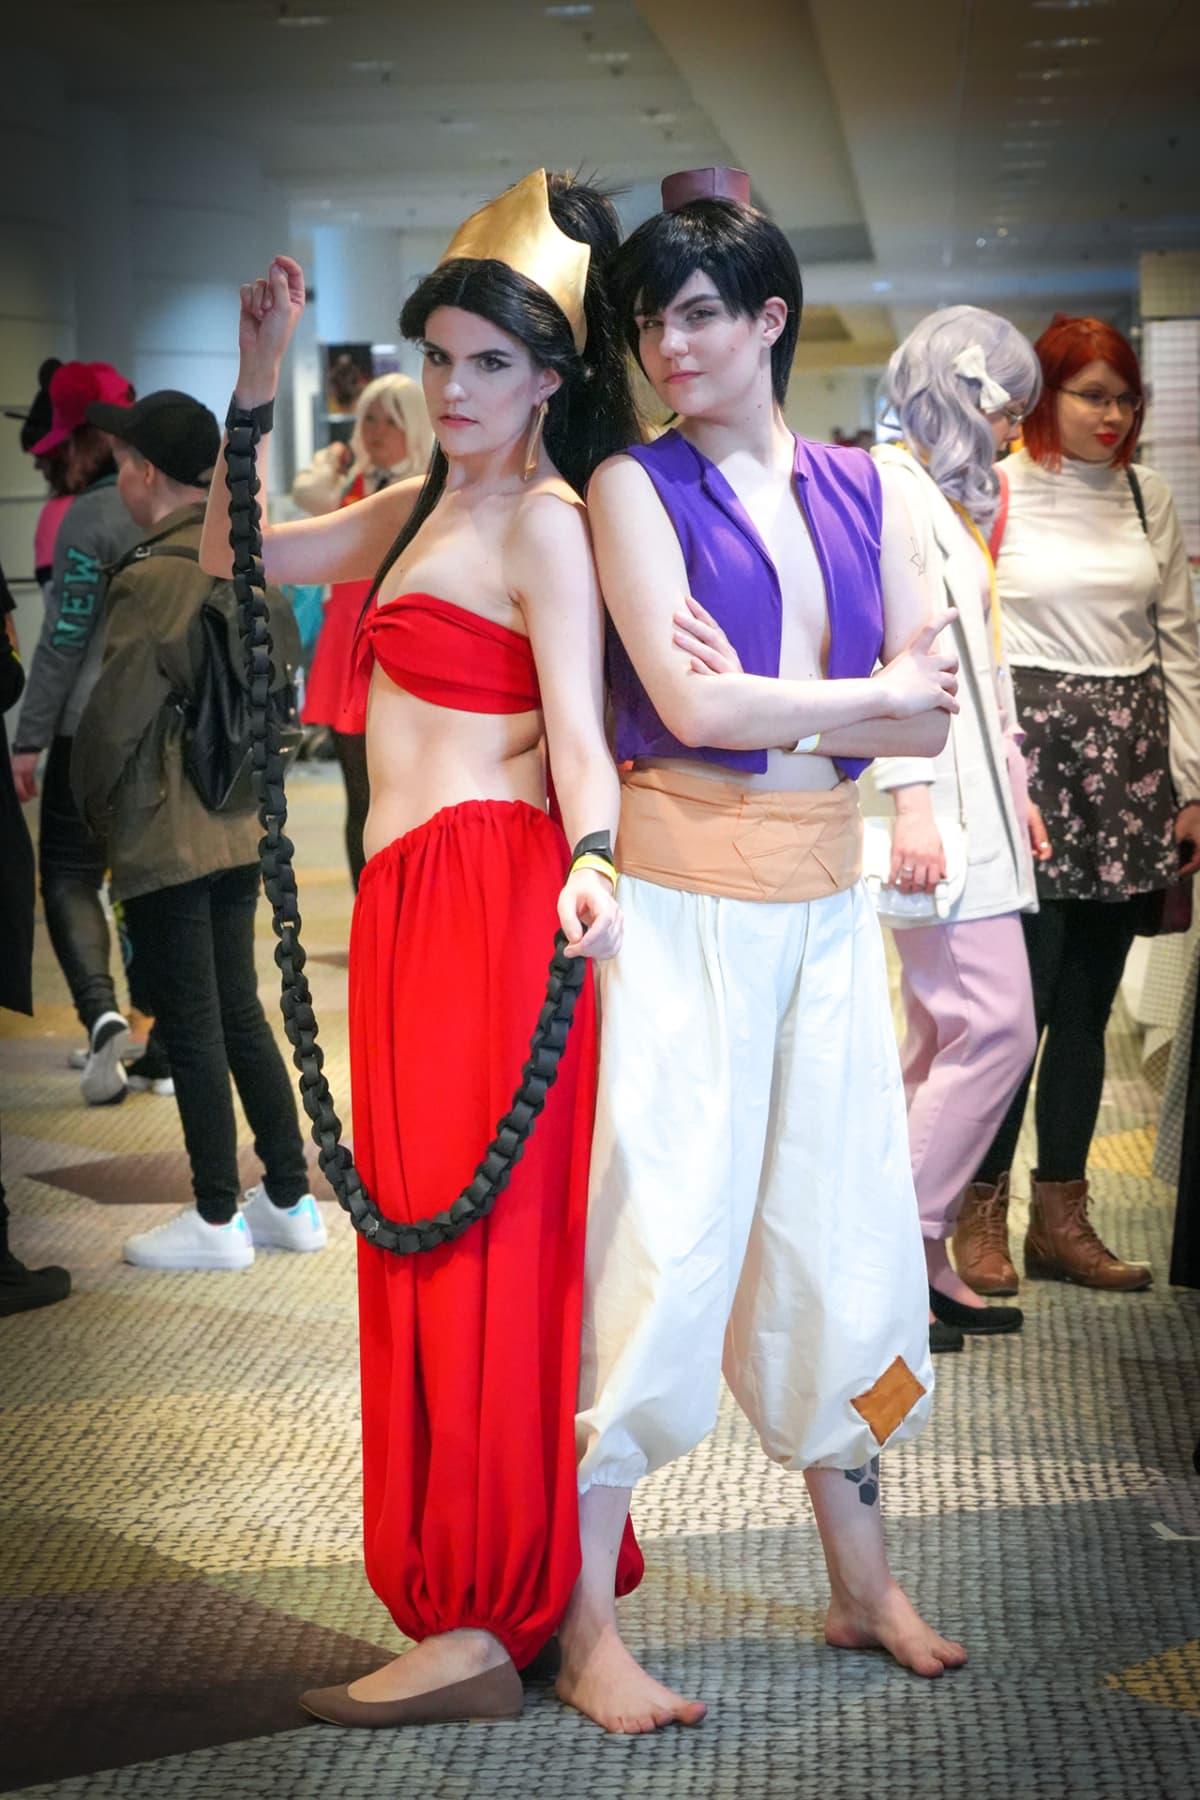 Prinssi Ali, Jasmine, Popcult, cosplay